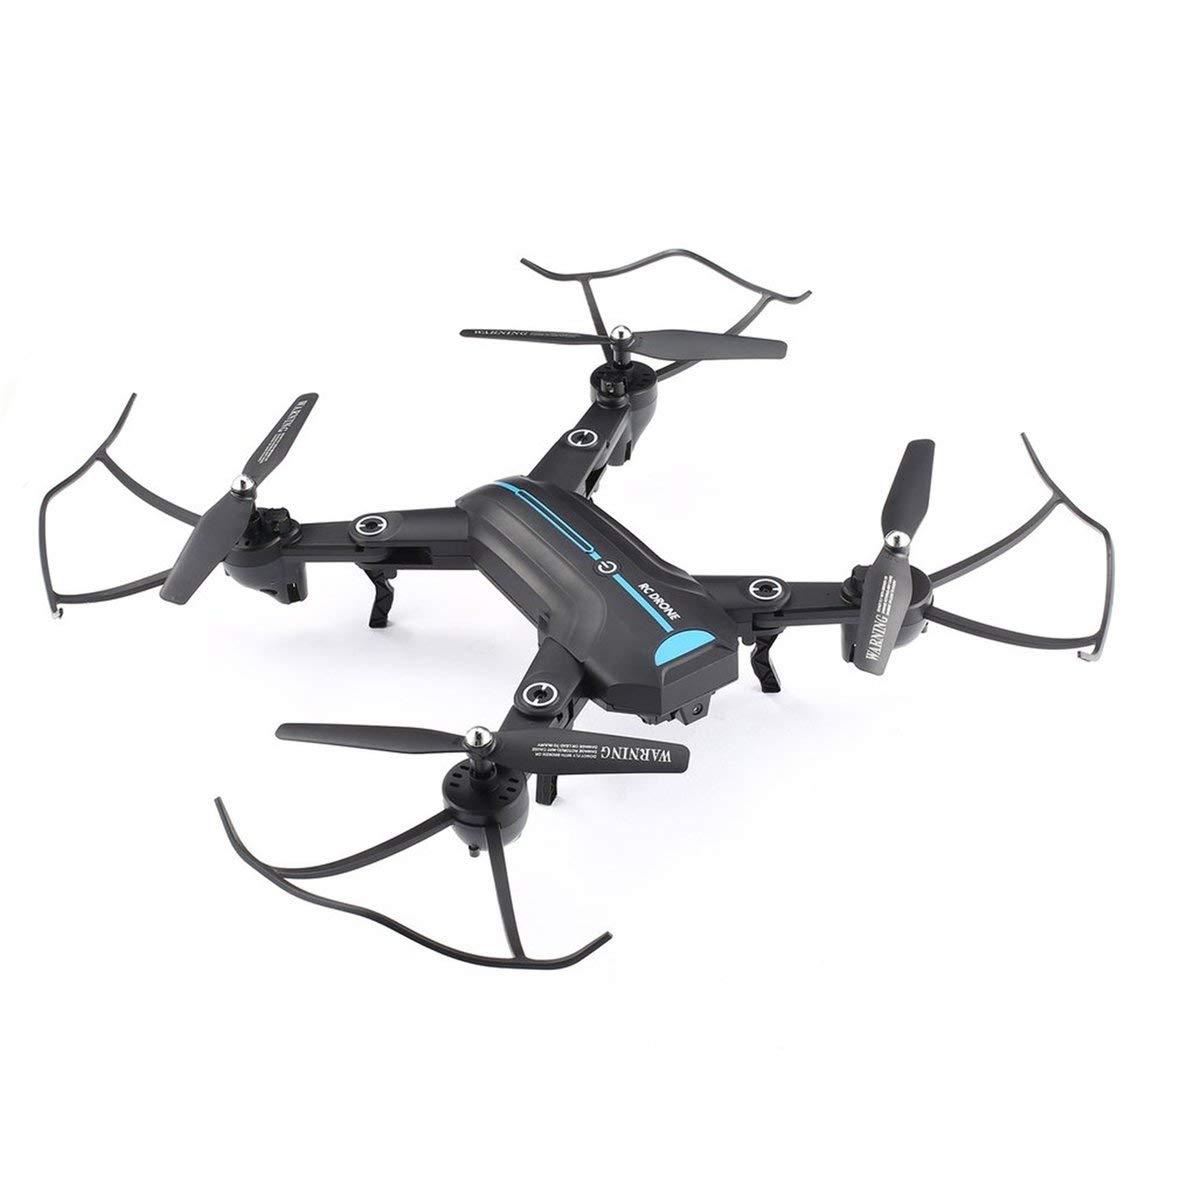 ToGames A6W Faltbare RC Drone 2,4 GHz Wi-Fi FPV mit Live-Kamera Video RTF Flugzeug Quadcopter Schwerkraft-Sensor Höhe Halten Headless